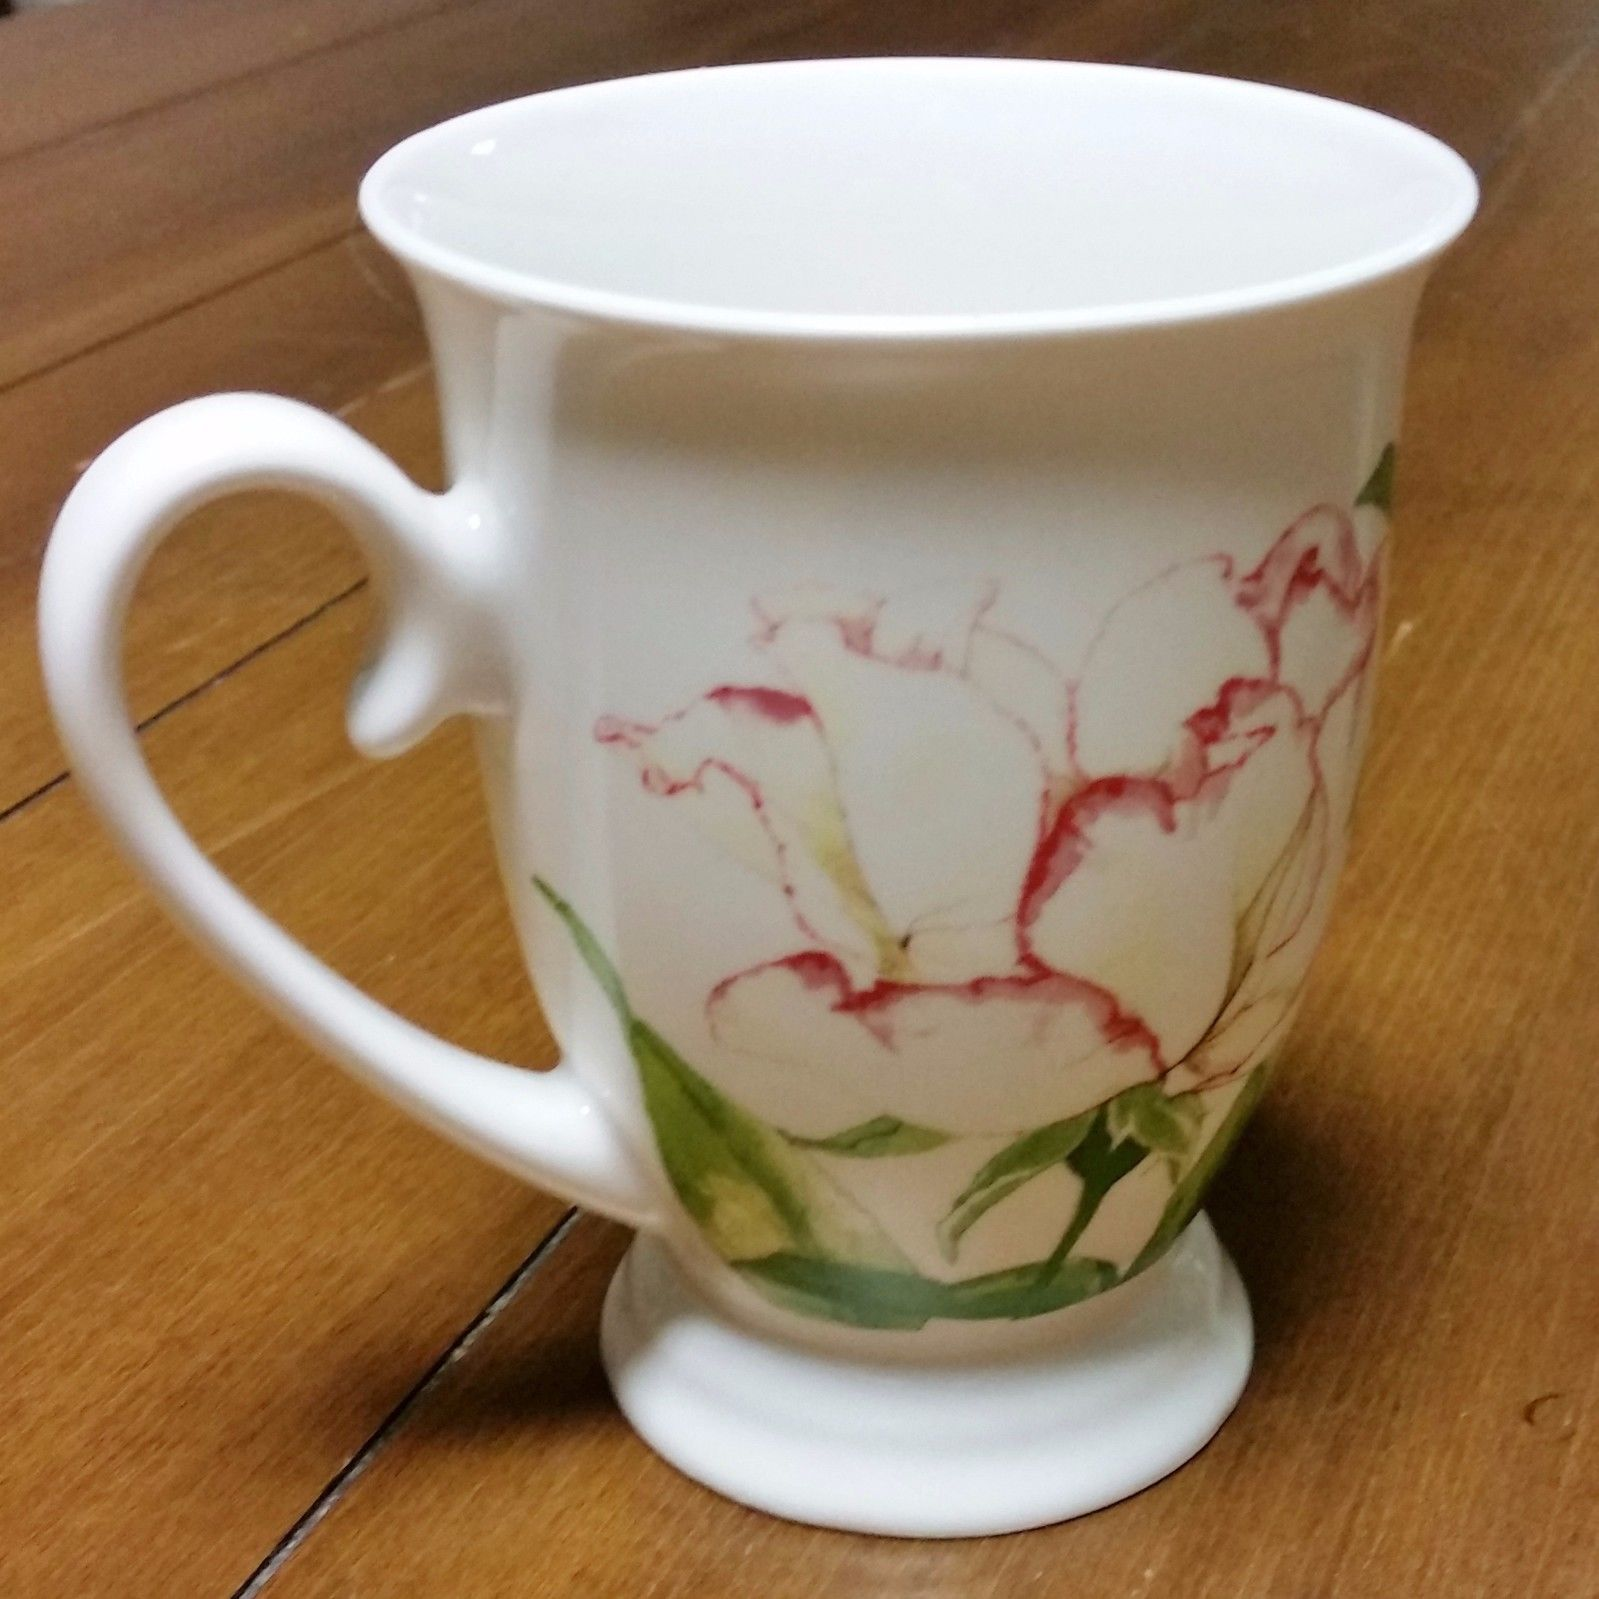 Portmeirion Botanic Garden Footed Tea Coffee Mug Rose Flower Pink White Green Portmeirion